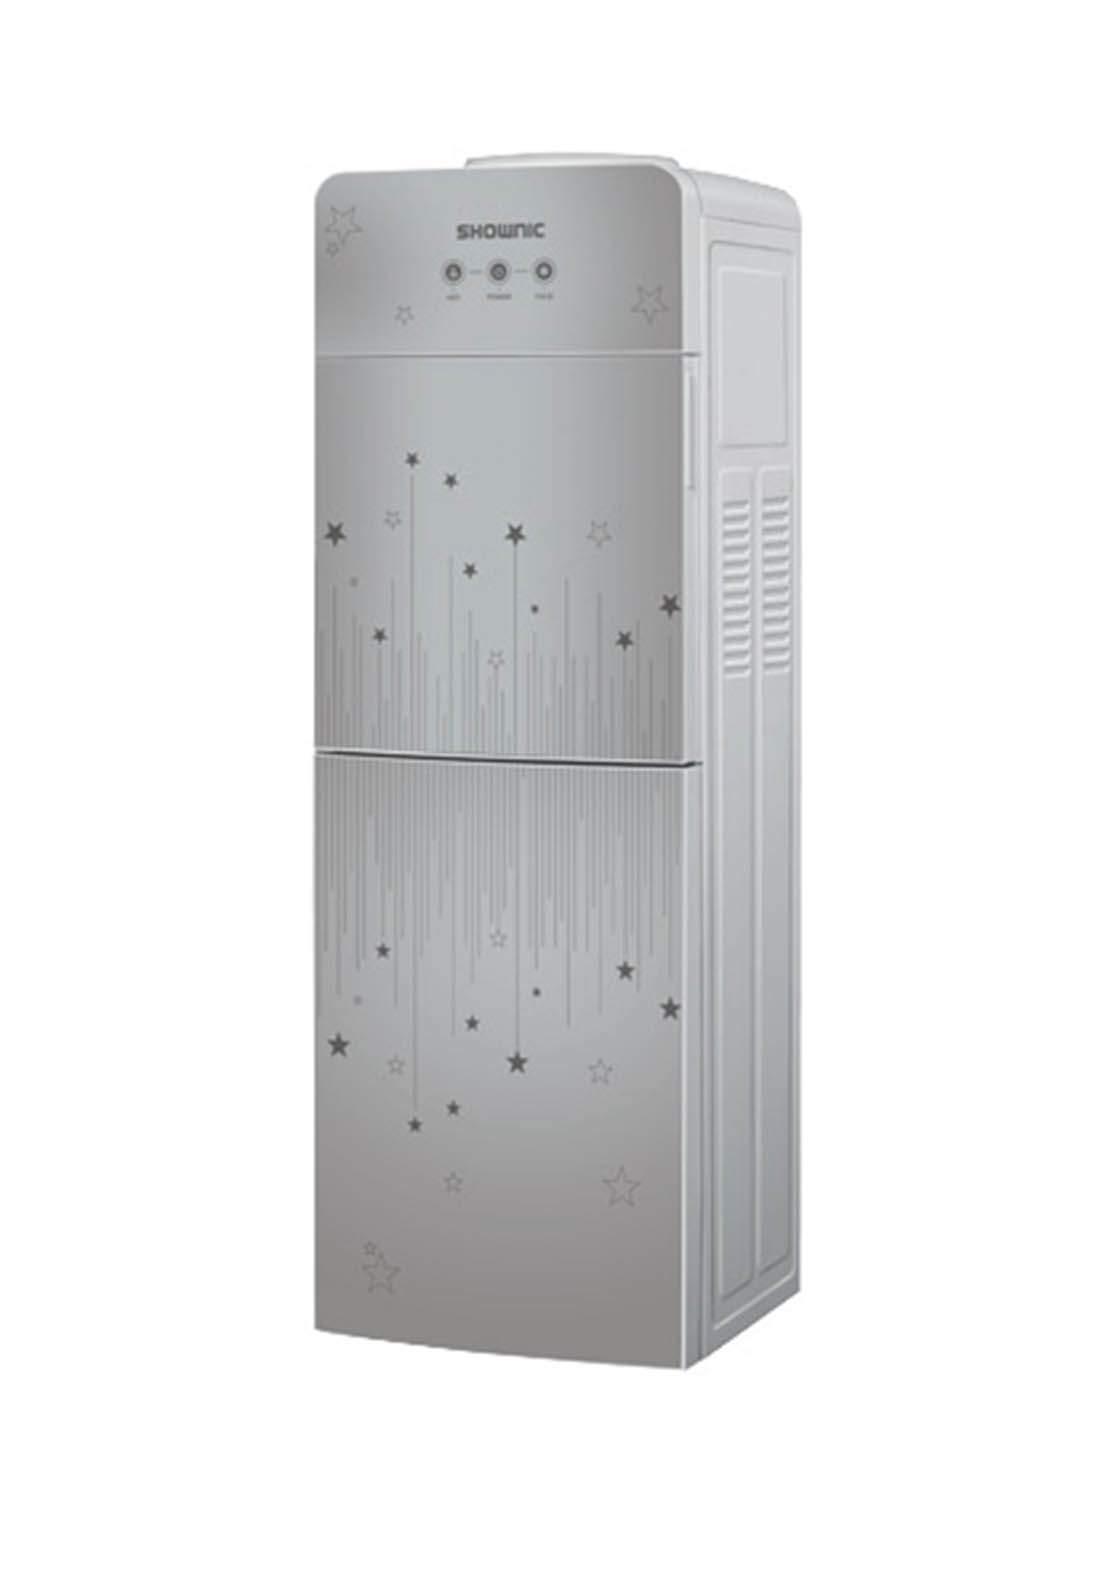 Shownic YT-R378SG Water Dispenser with fridger  براد ماء مع ثلاجة